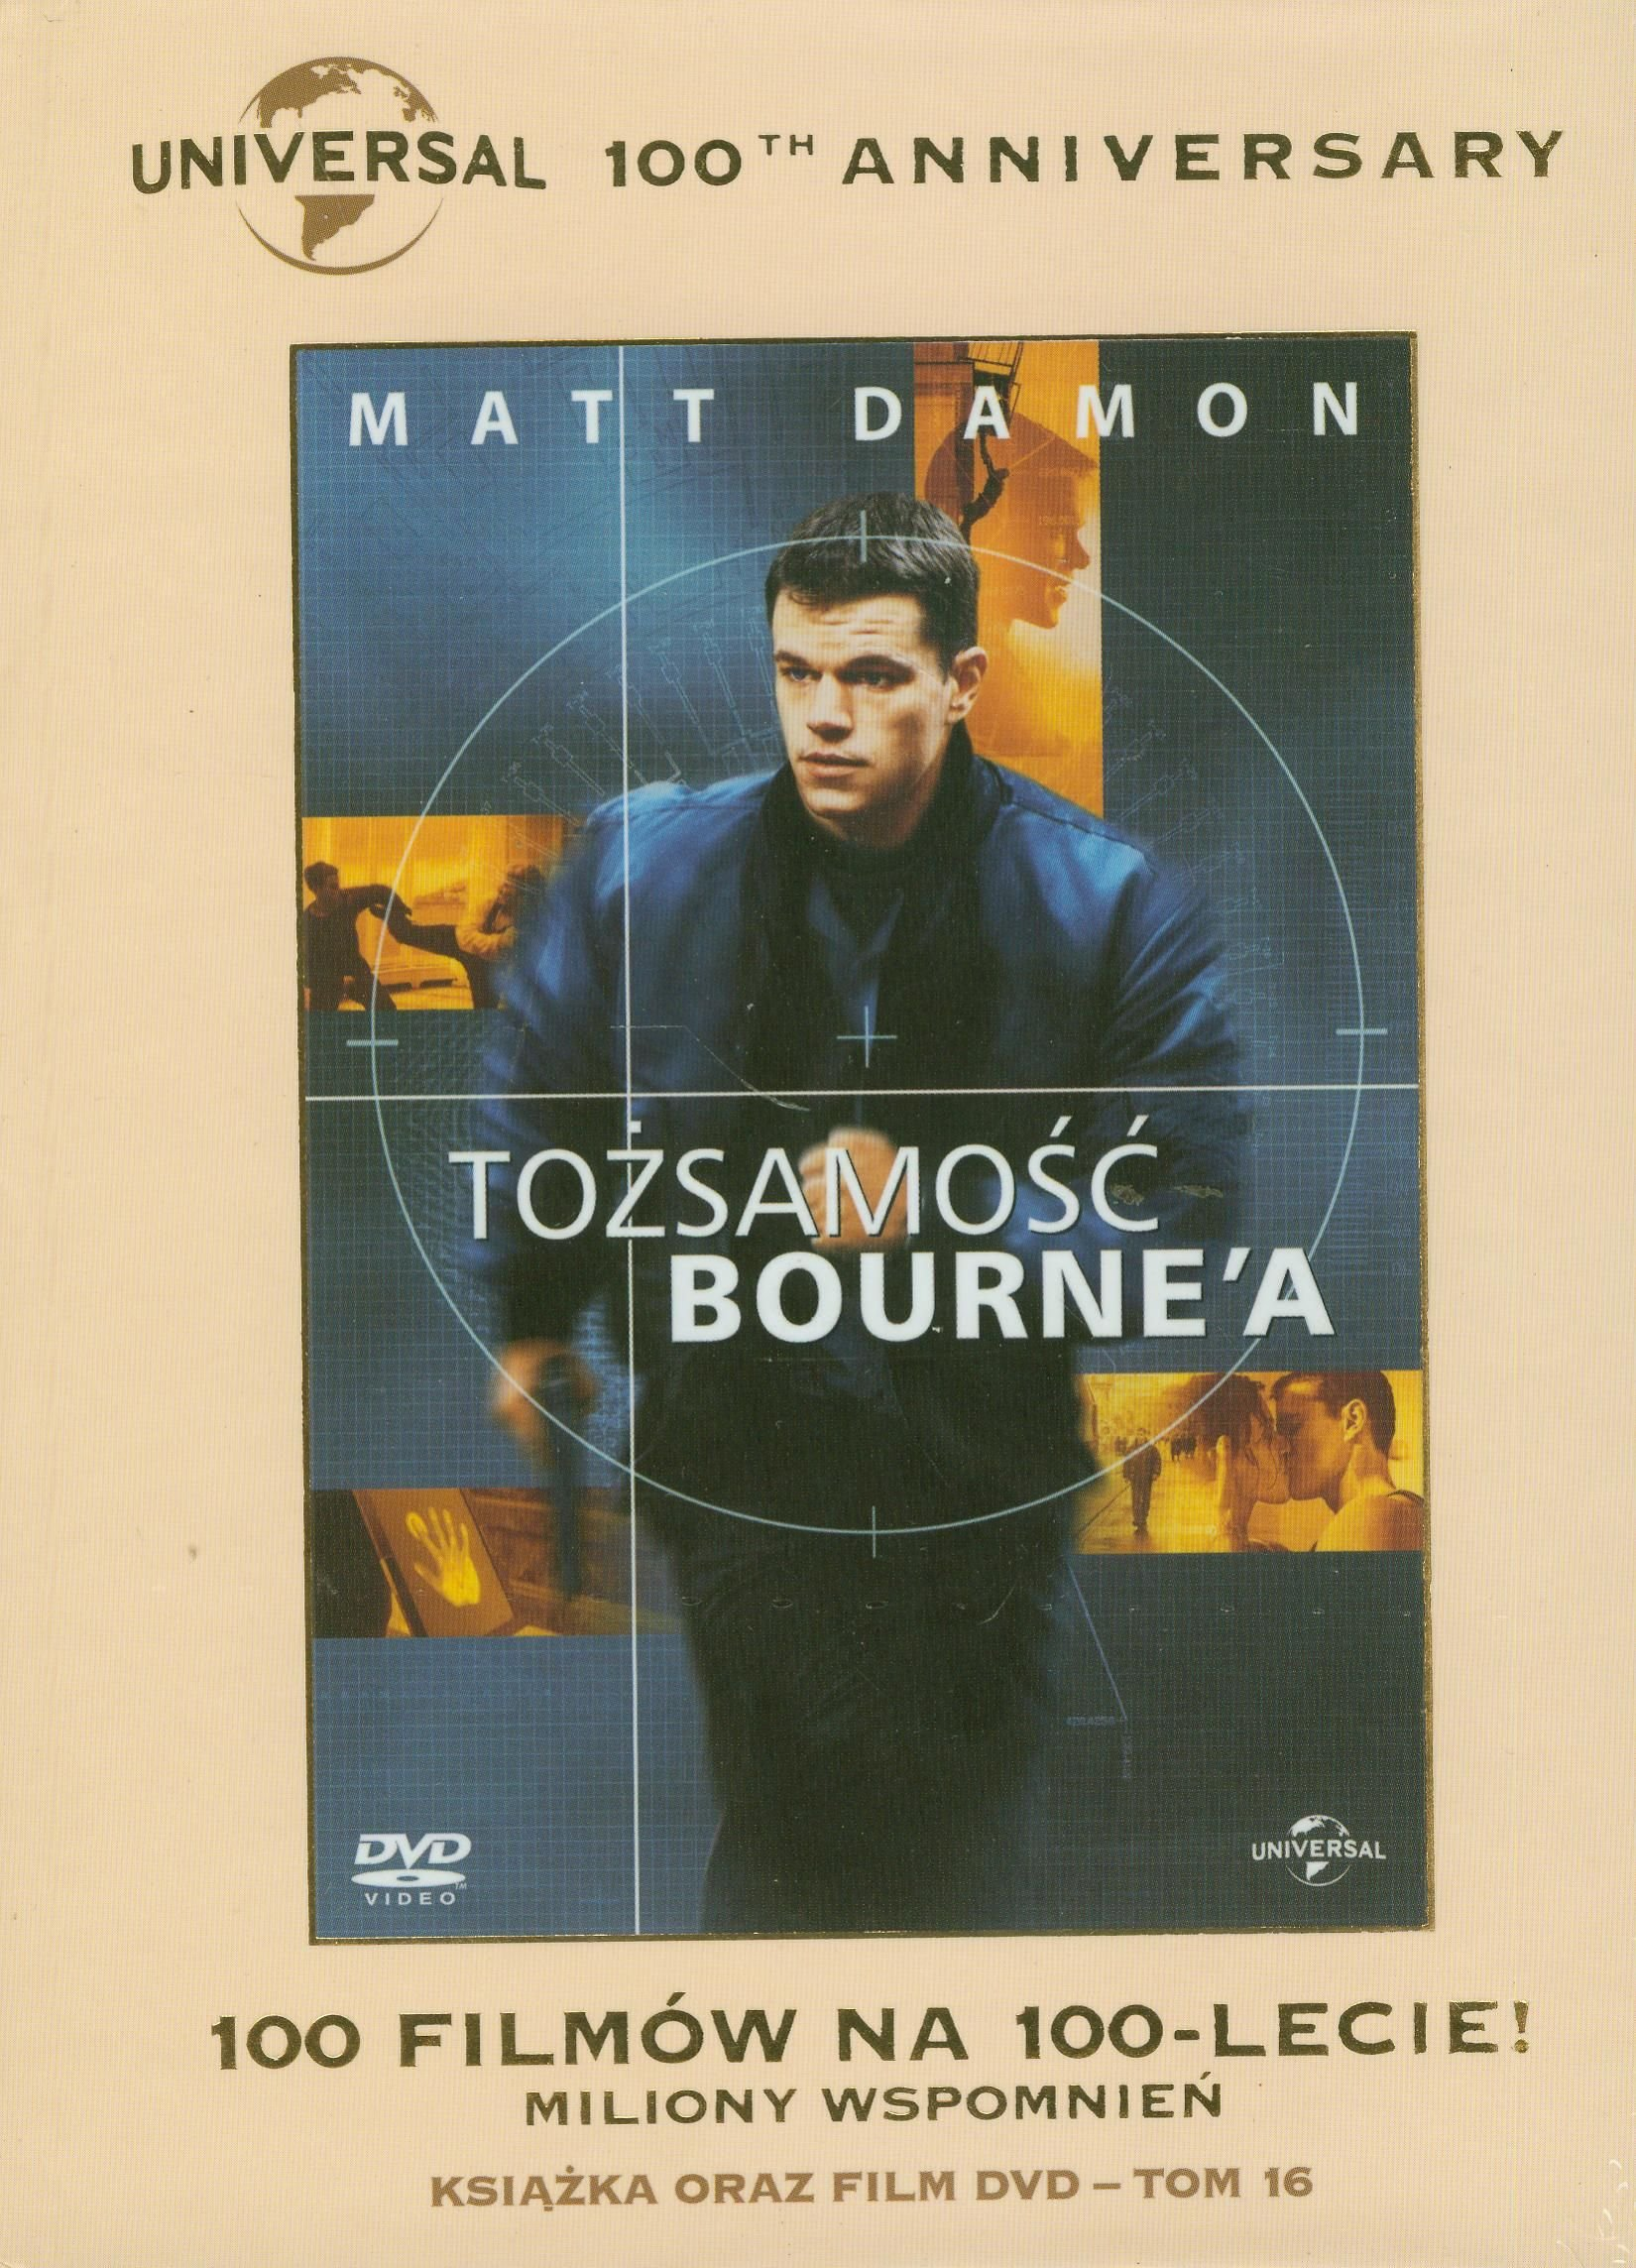 Tozsamosc Bourne'a